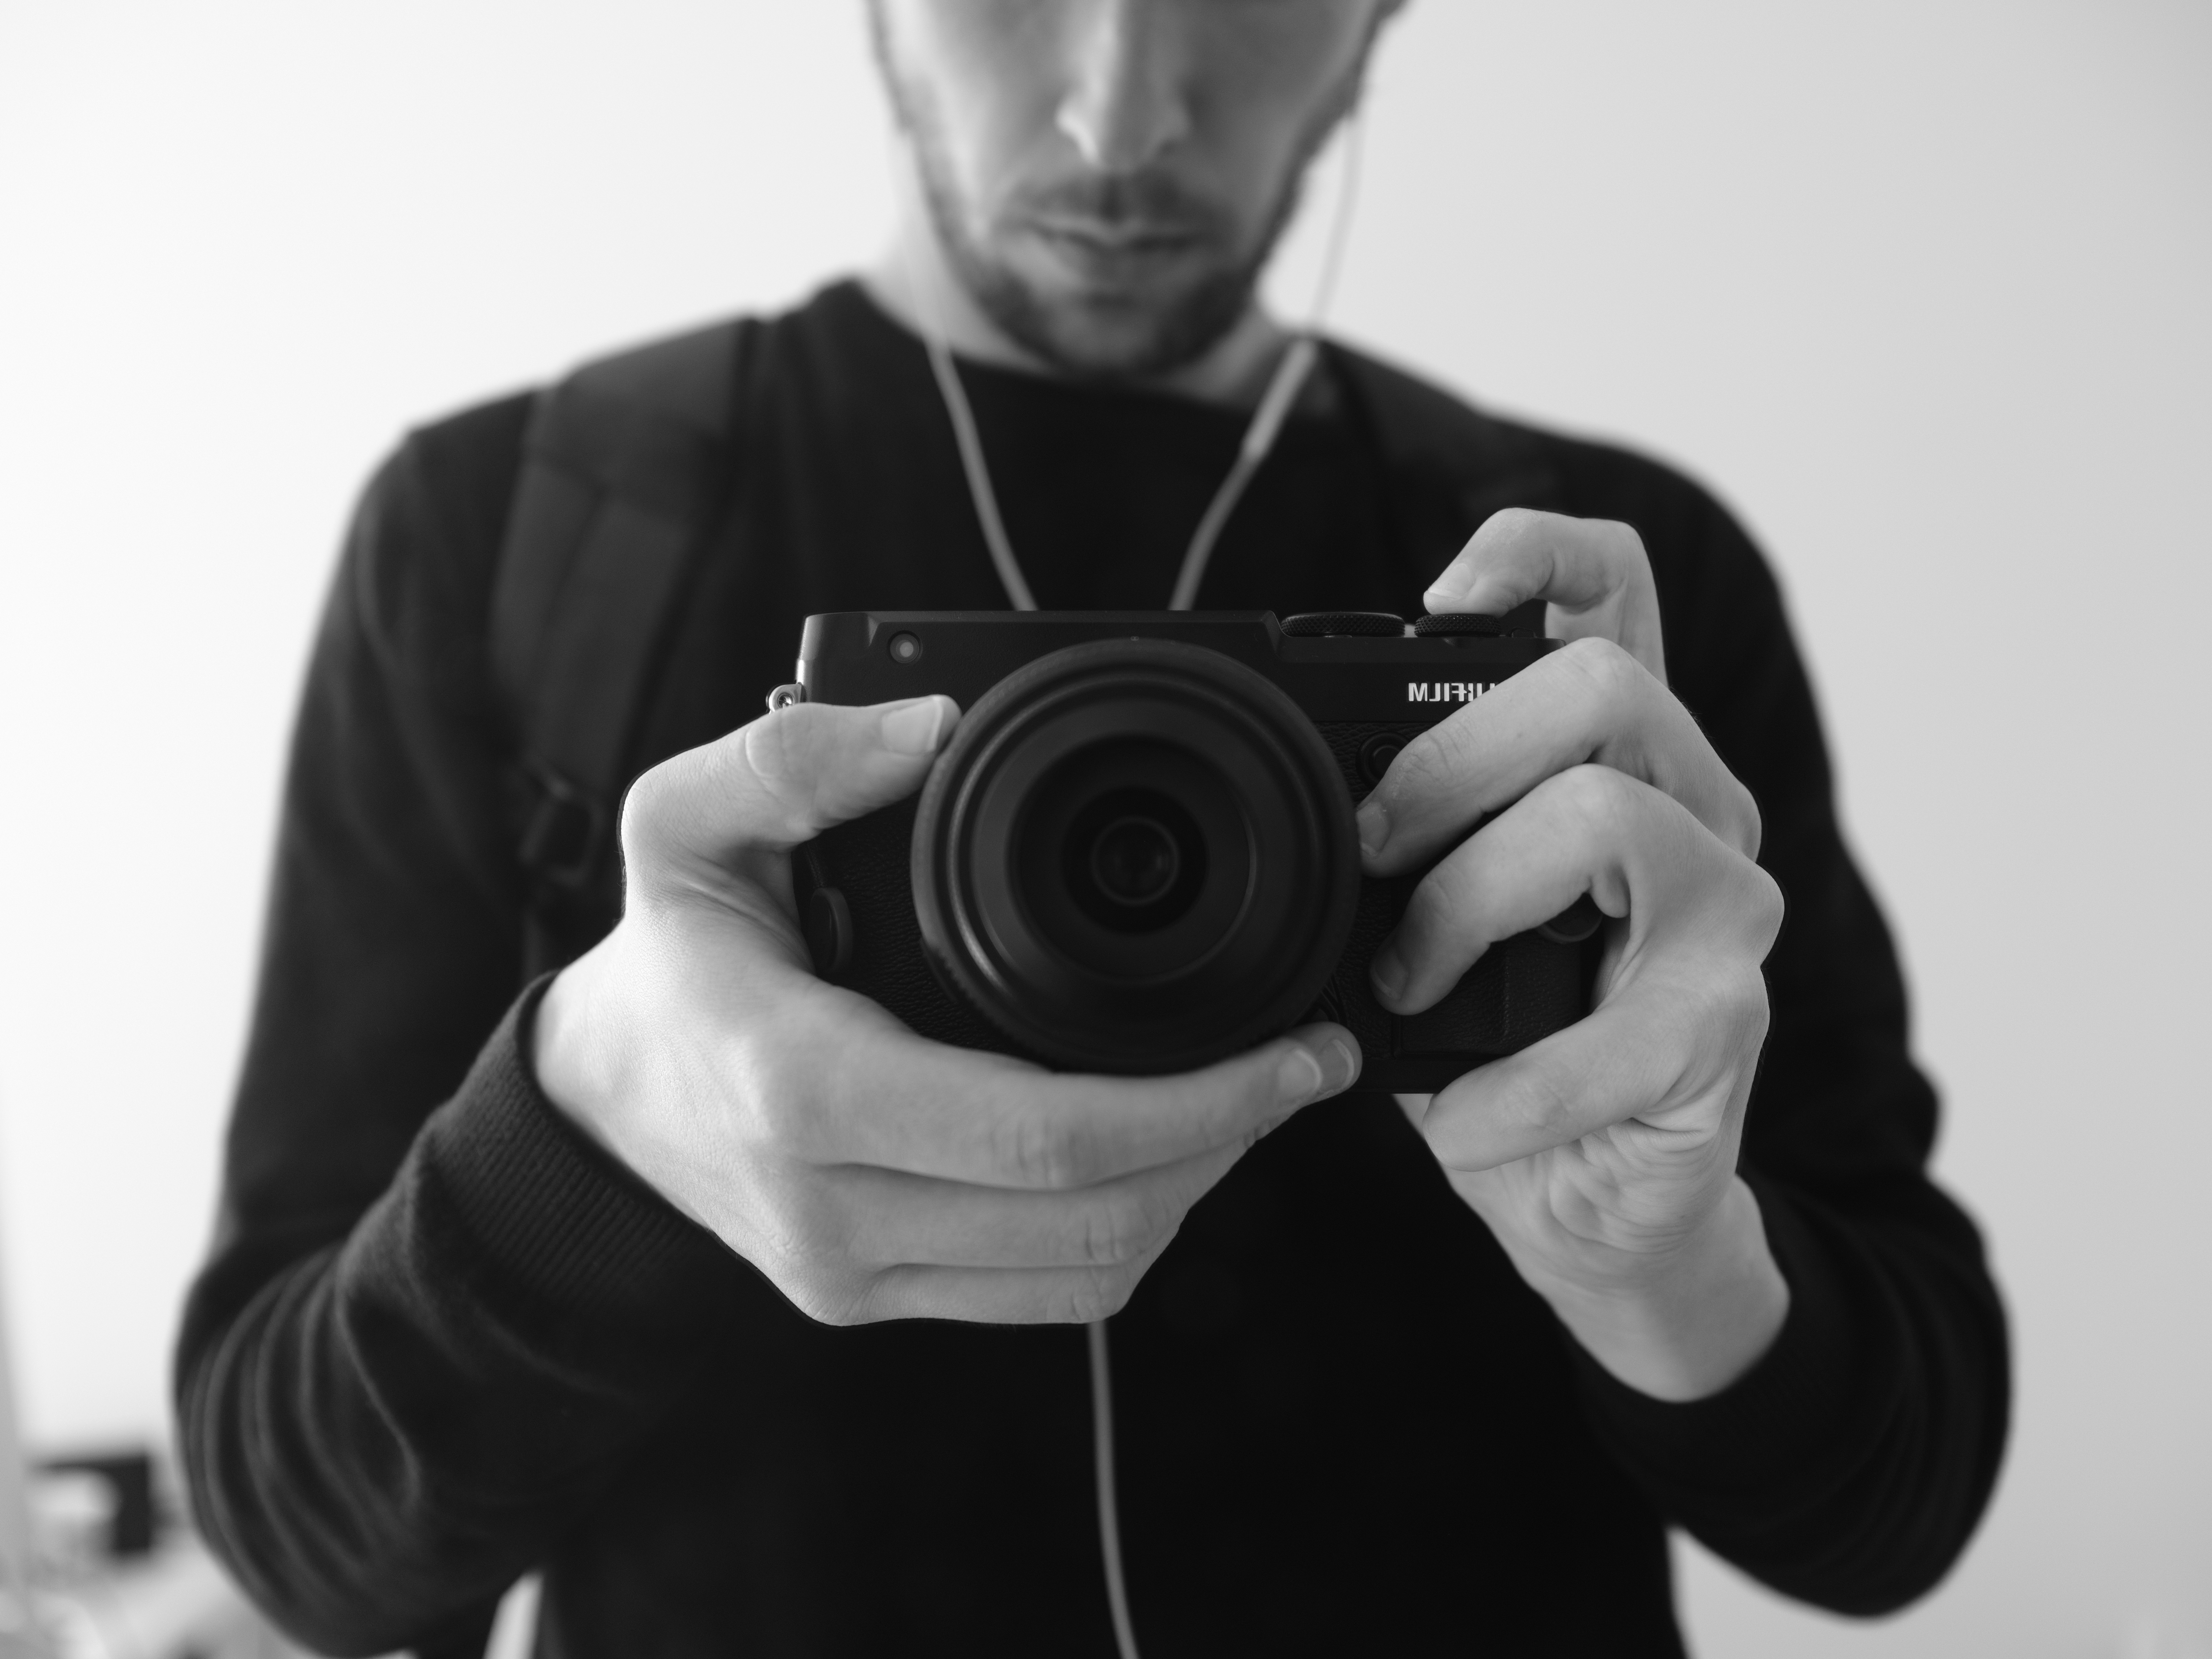 Kruh se uzavřel - recenze GFX 50mm f/3.5